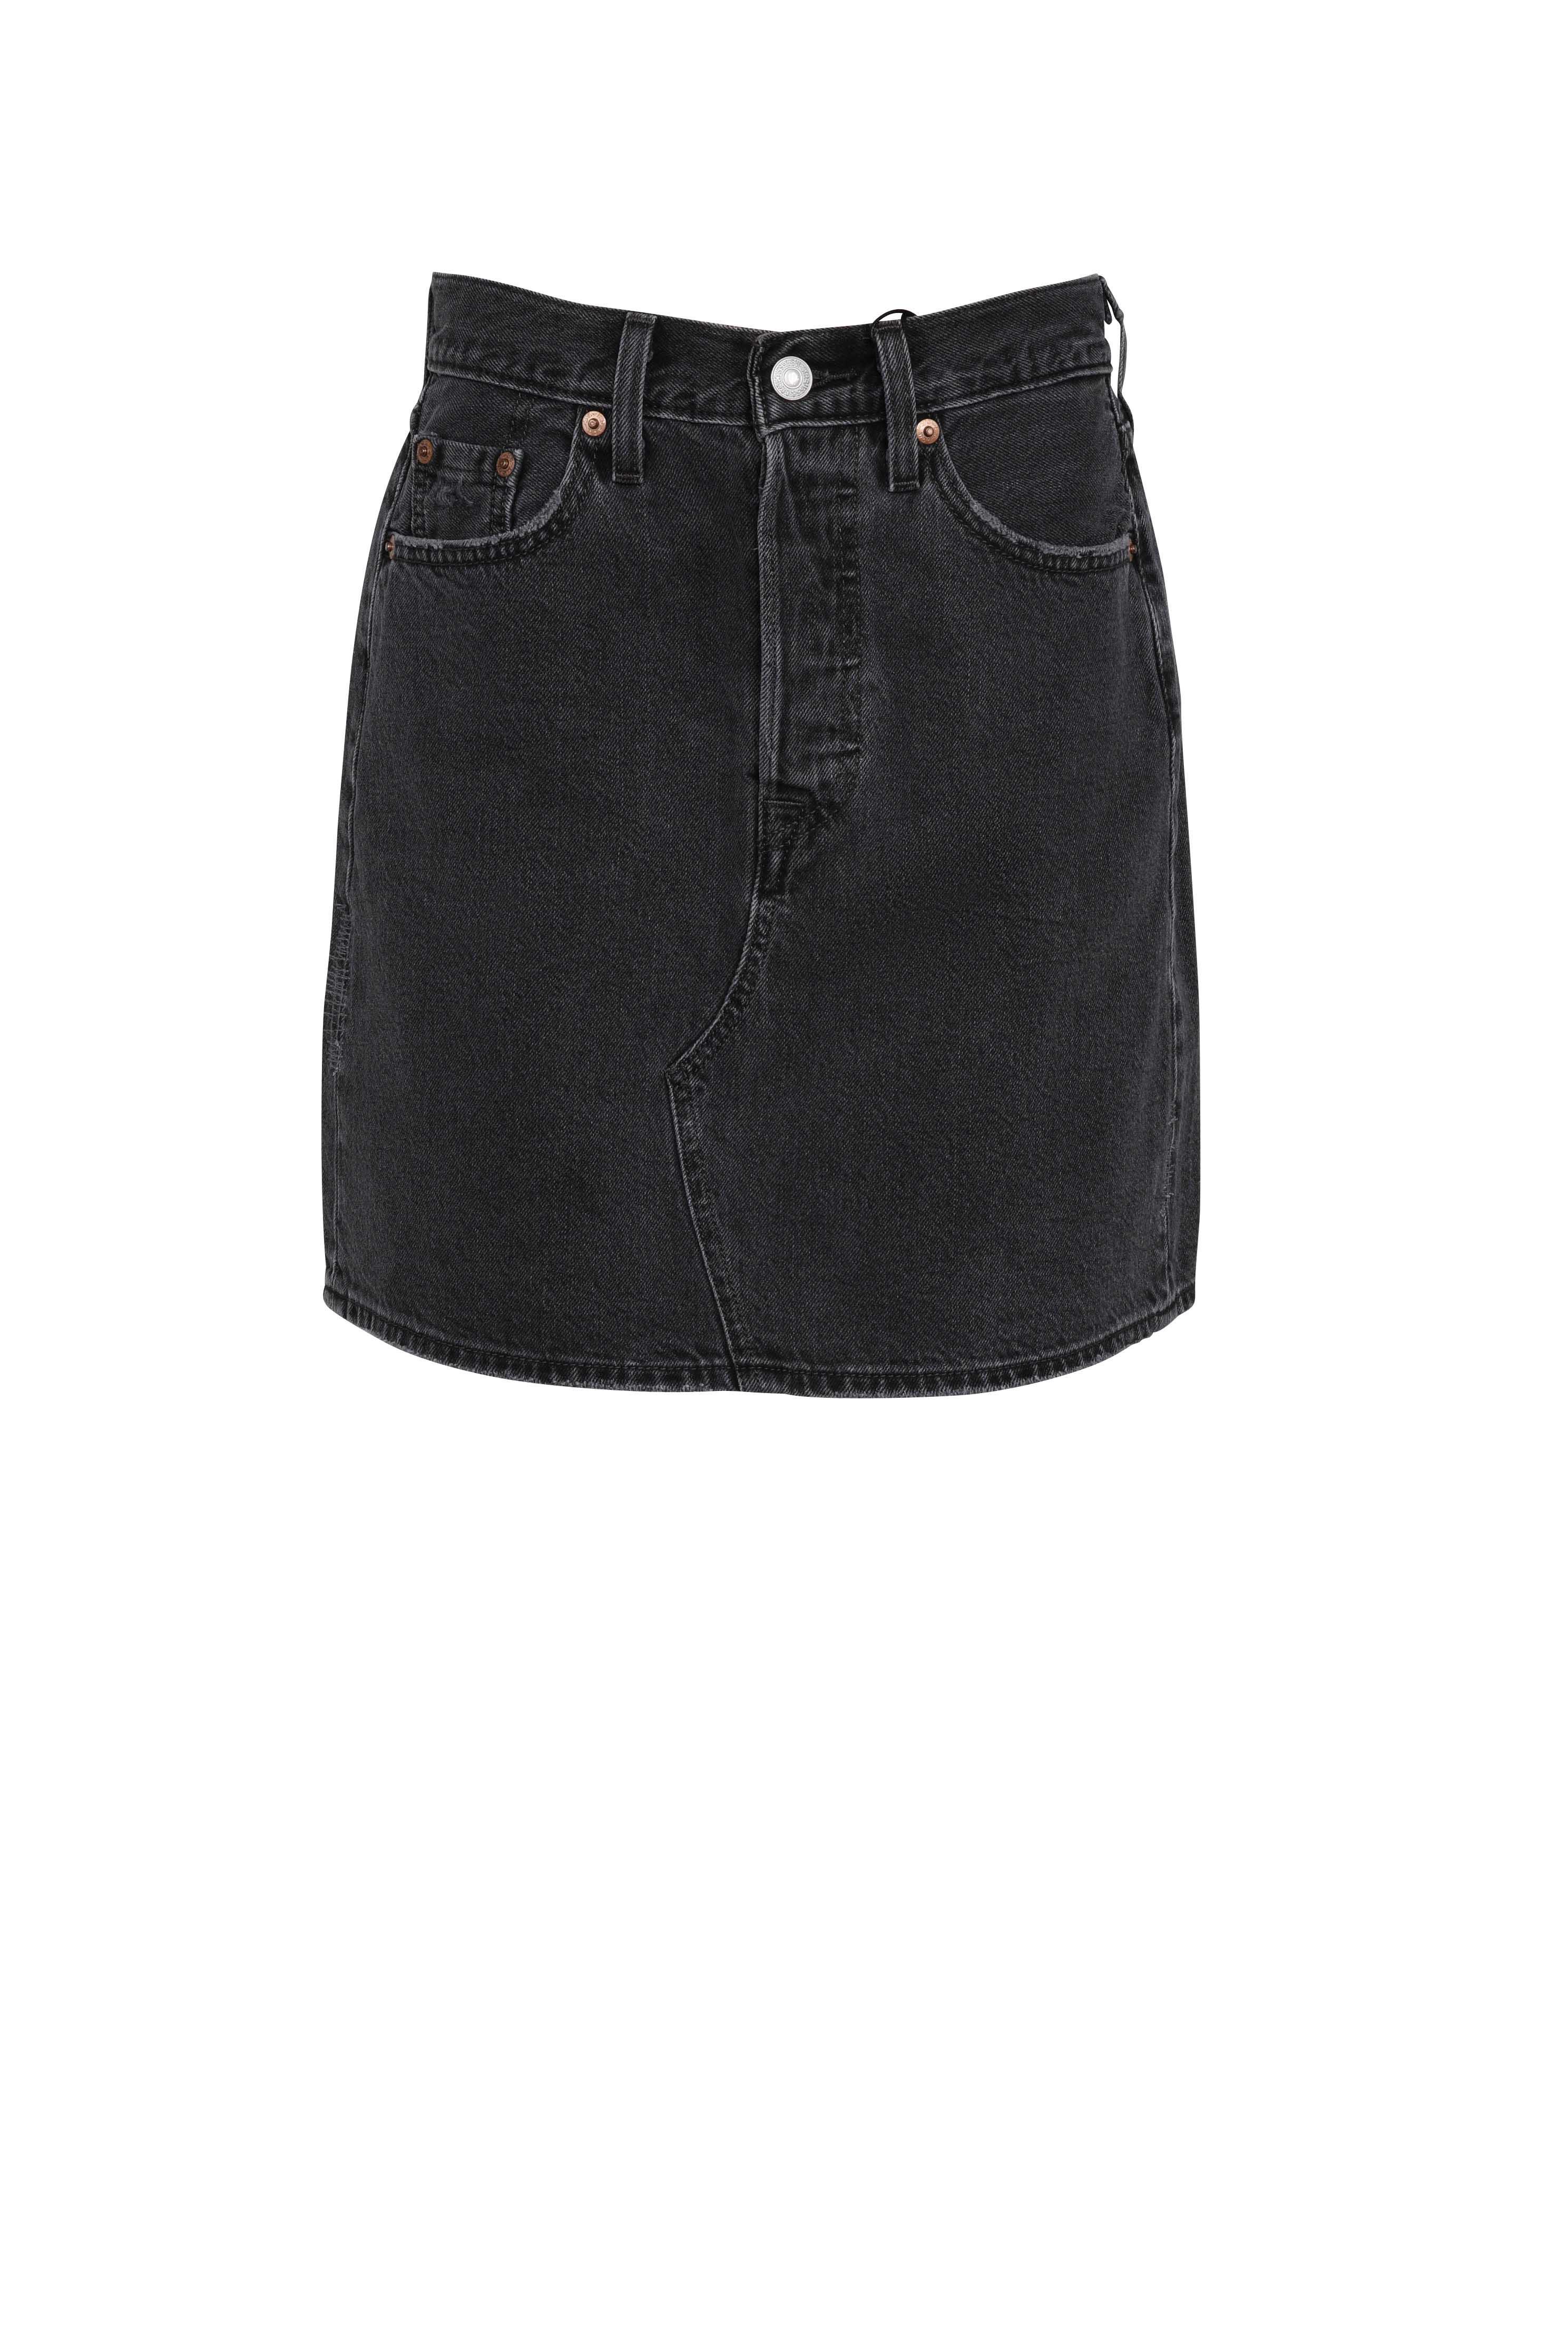 Iconic Skirt